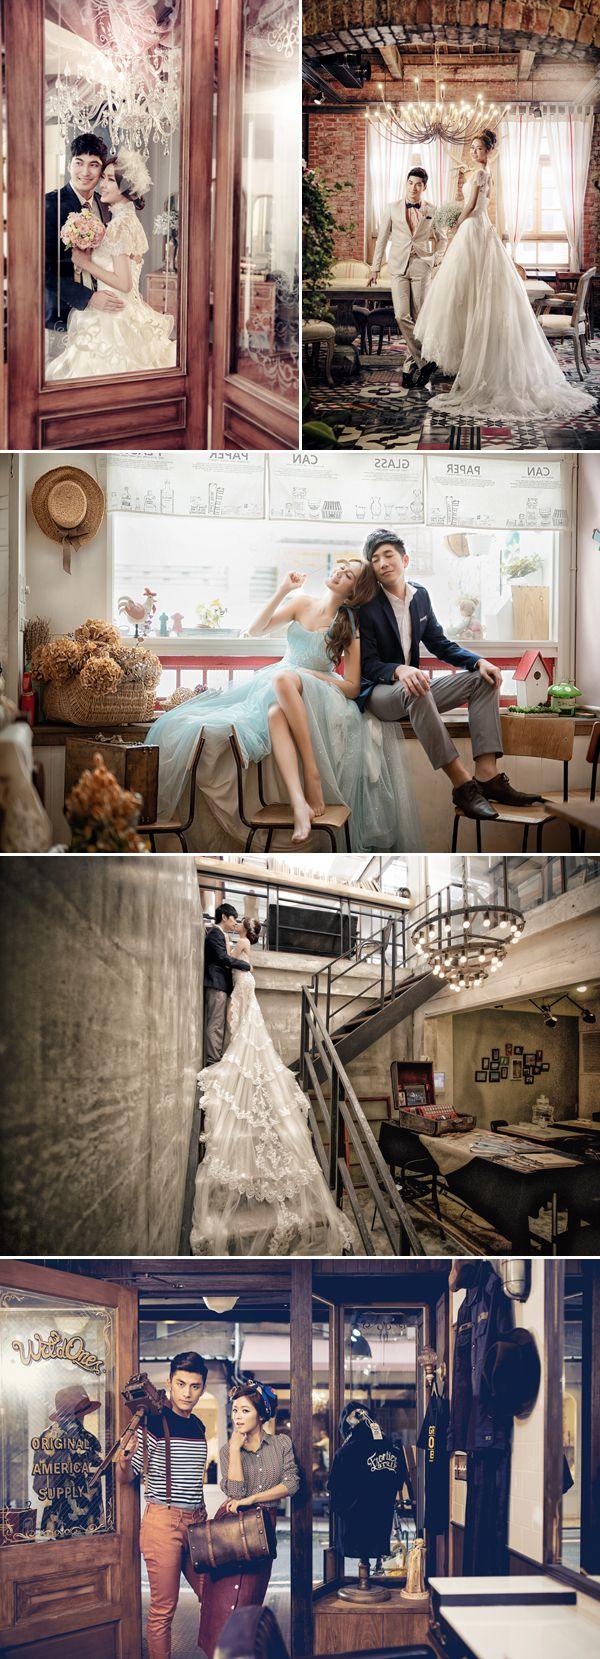 best свадебные фото идеи images on pinterest wedding pictures